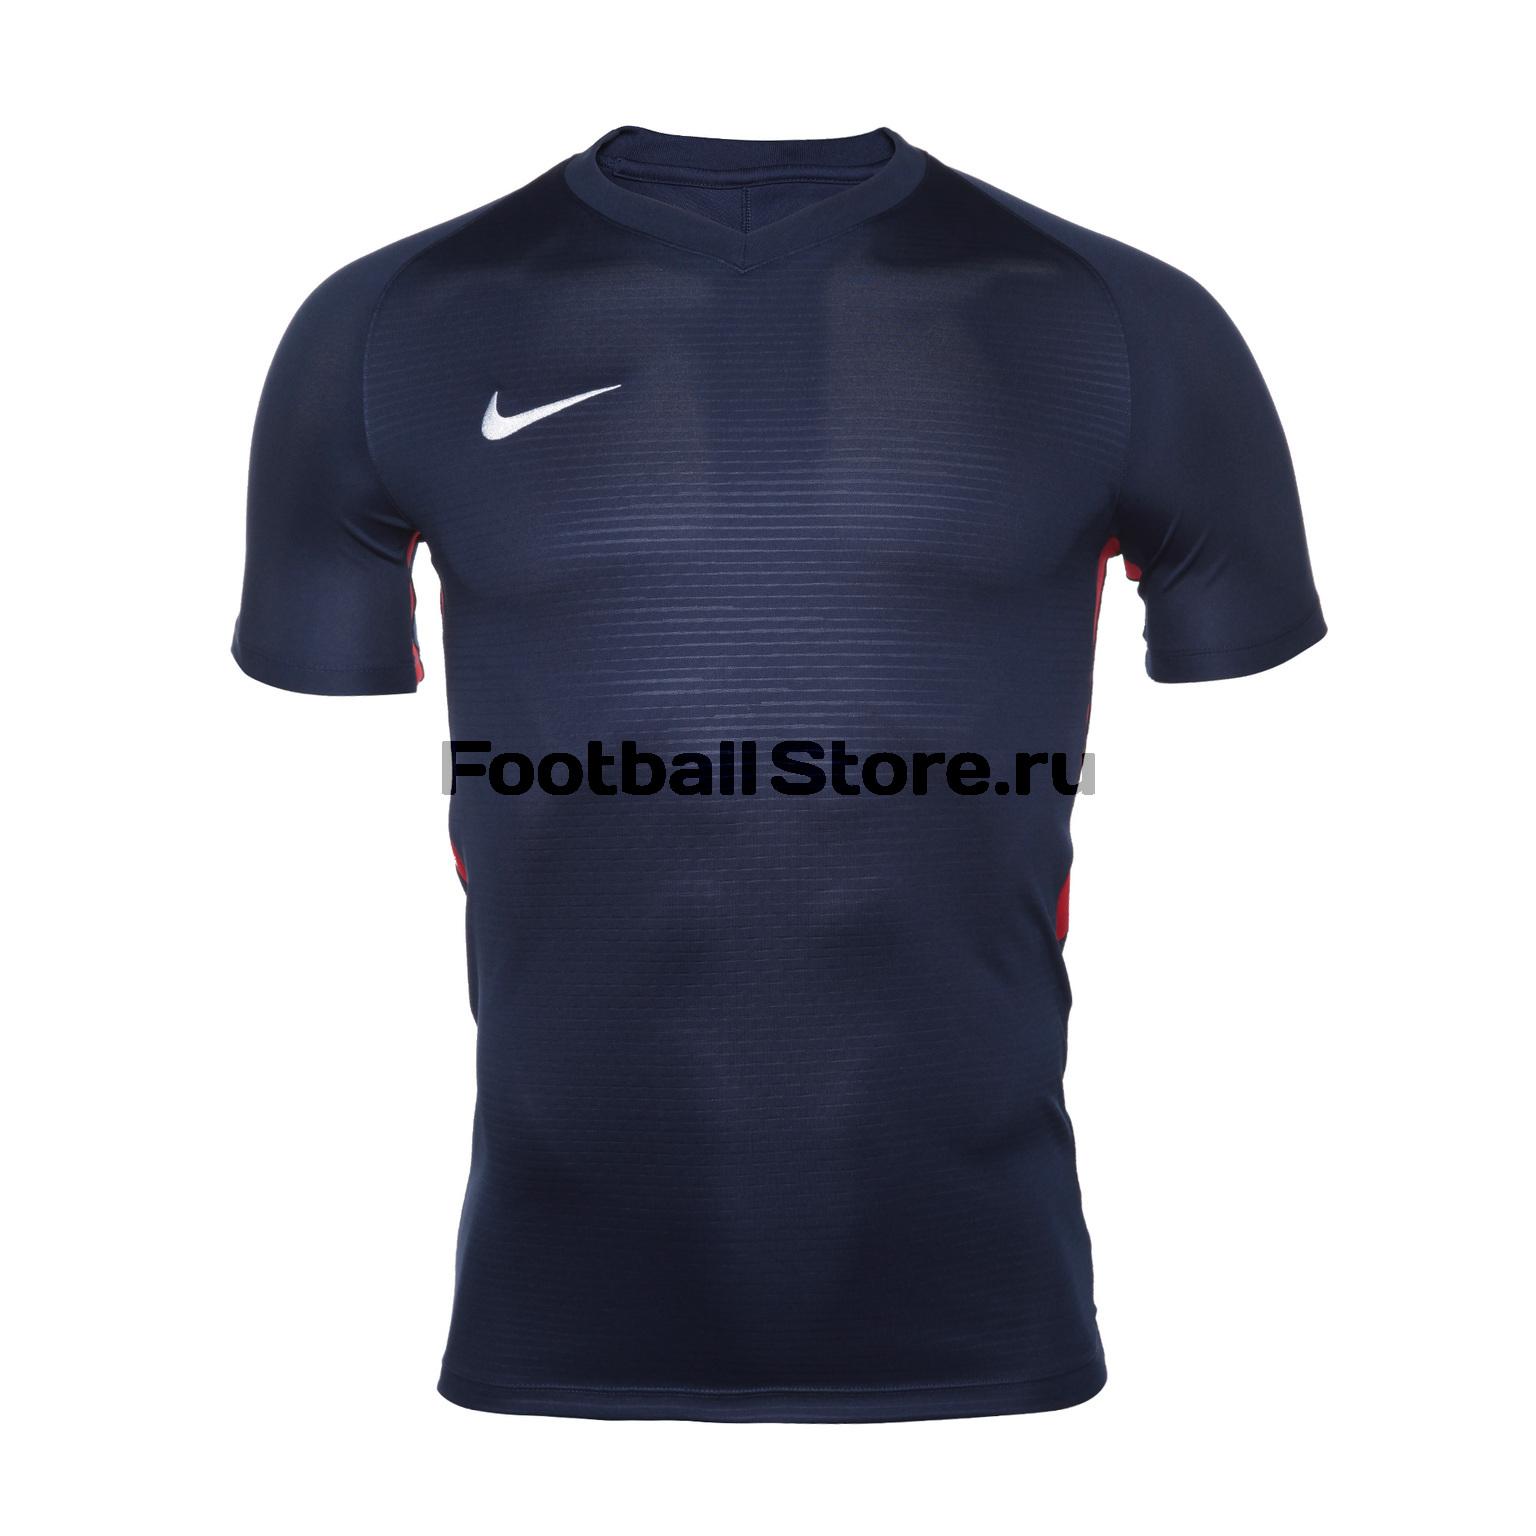 Футболка игровая Nike Dry Tiempo Prem JSY SS 894230-410 футболка игровая nike dry tiempo prem jsy ss 894230 412